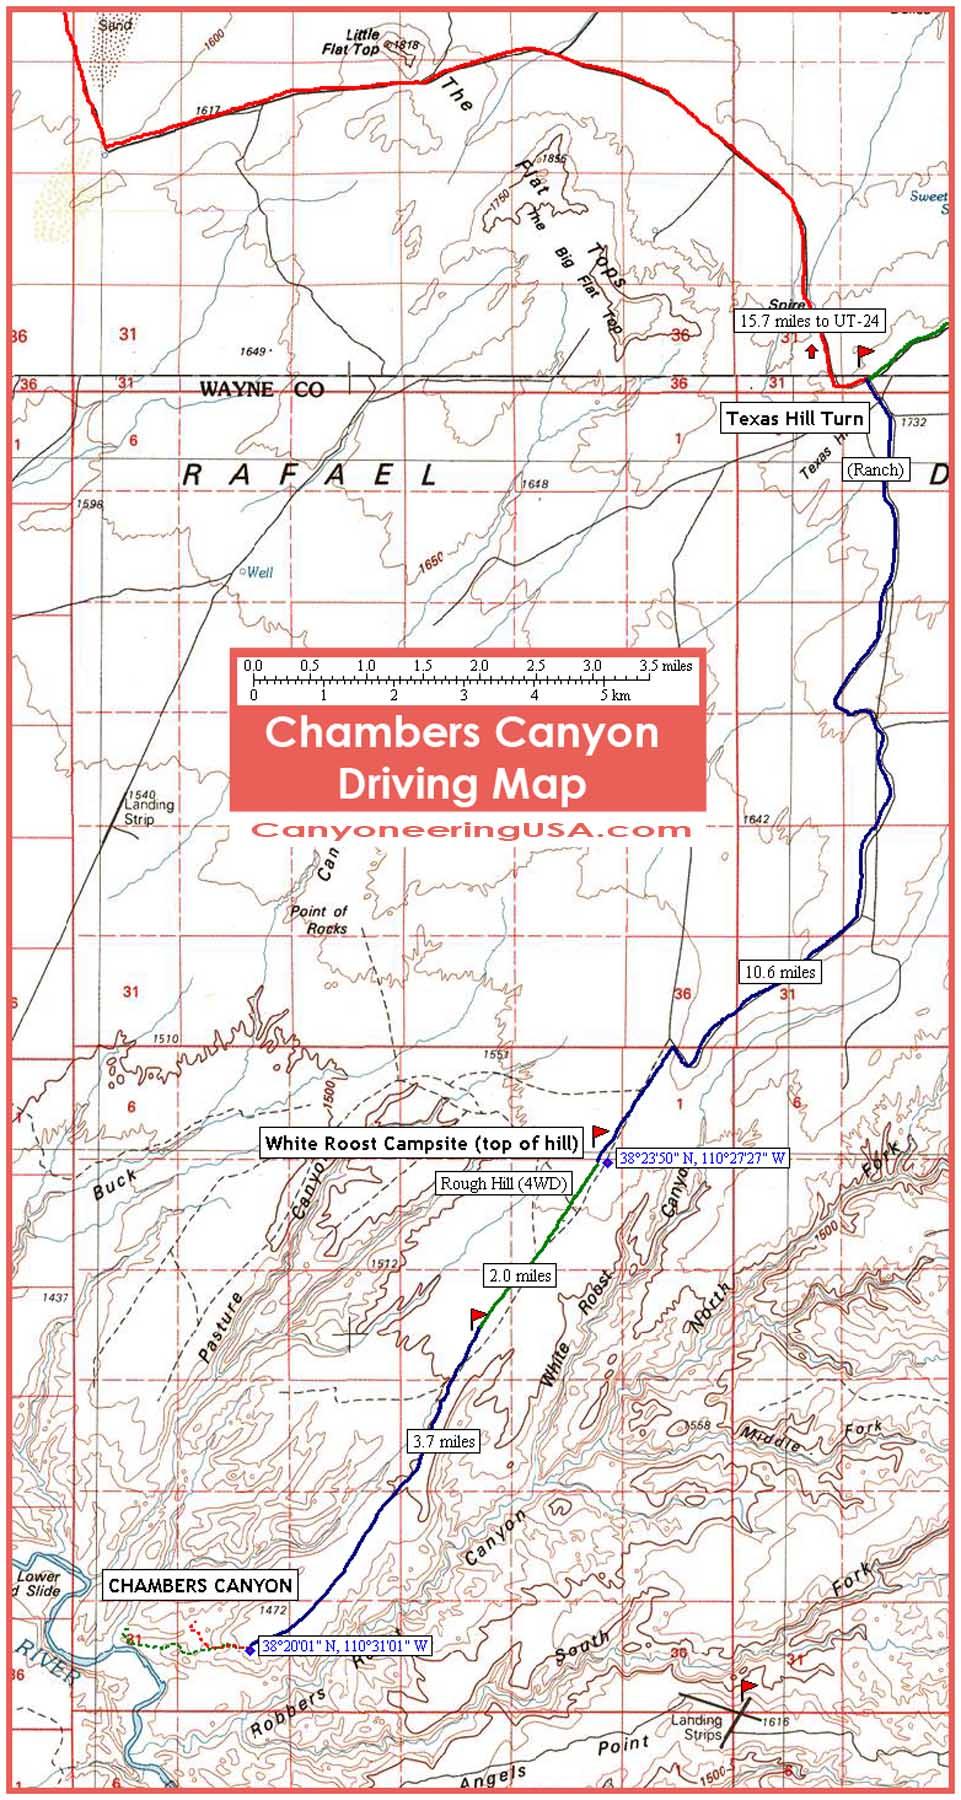 Chambers Canyon Driving Map.jpg